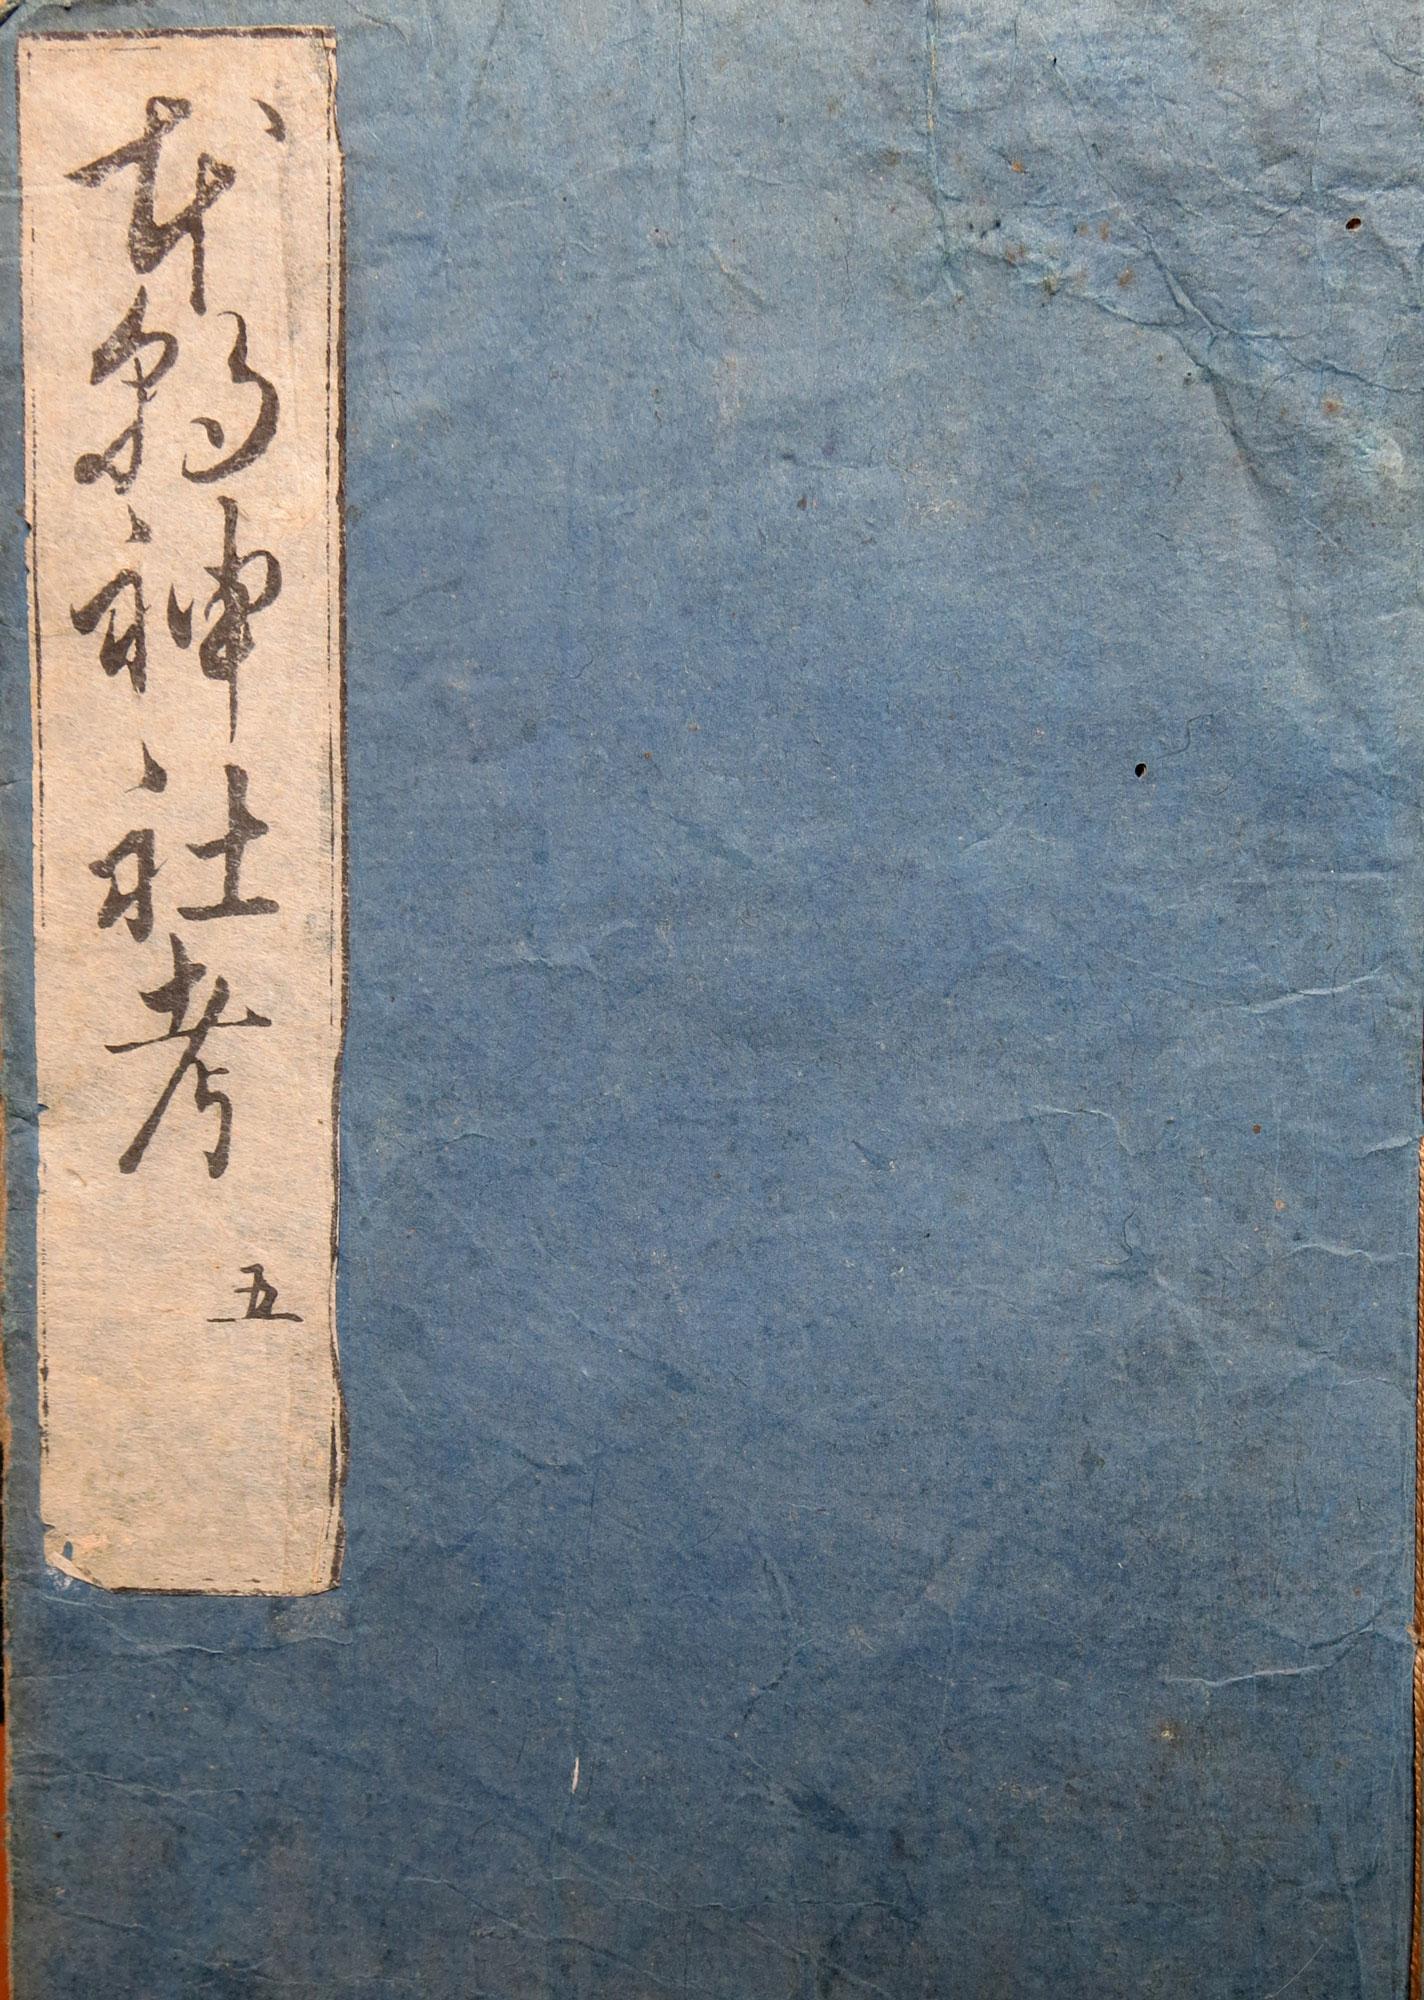 本朝神社考 Honchô jinja kô  [Réflexions sur les sanctuaires de notre empire. Treatise on the Shintô shrines of our empire]